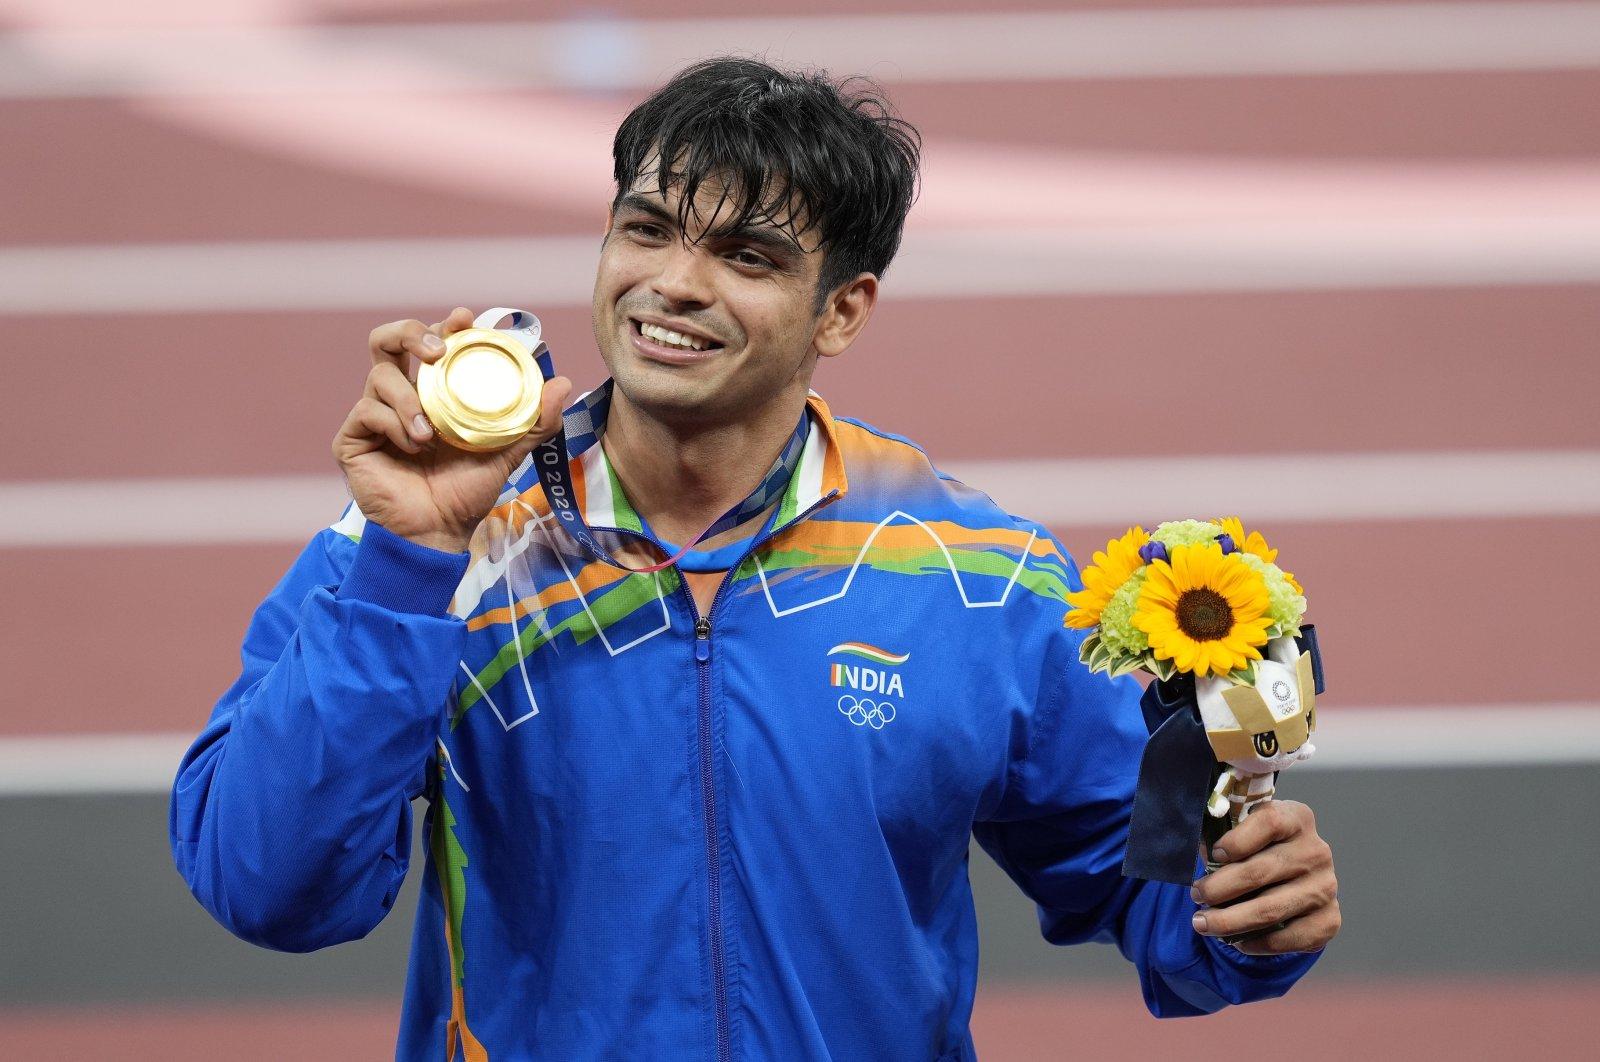 India's Neeraj Chopra celebrates winning gold in the men's javelin throw final during the Tokyo 2020 Olympic Games, Tokyo, Japan, Aug. 7, 2021. (EPA Photo)